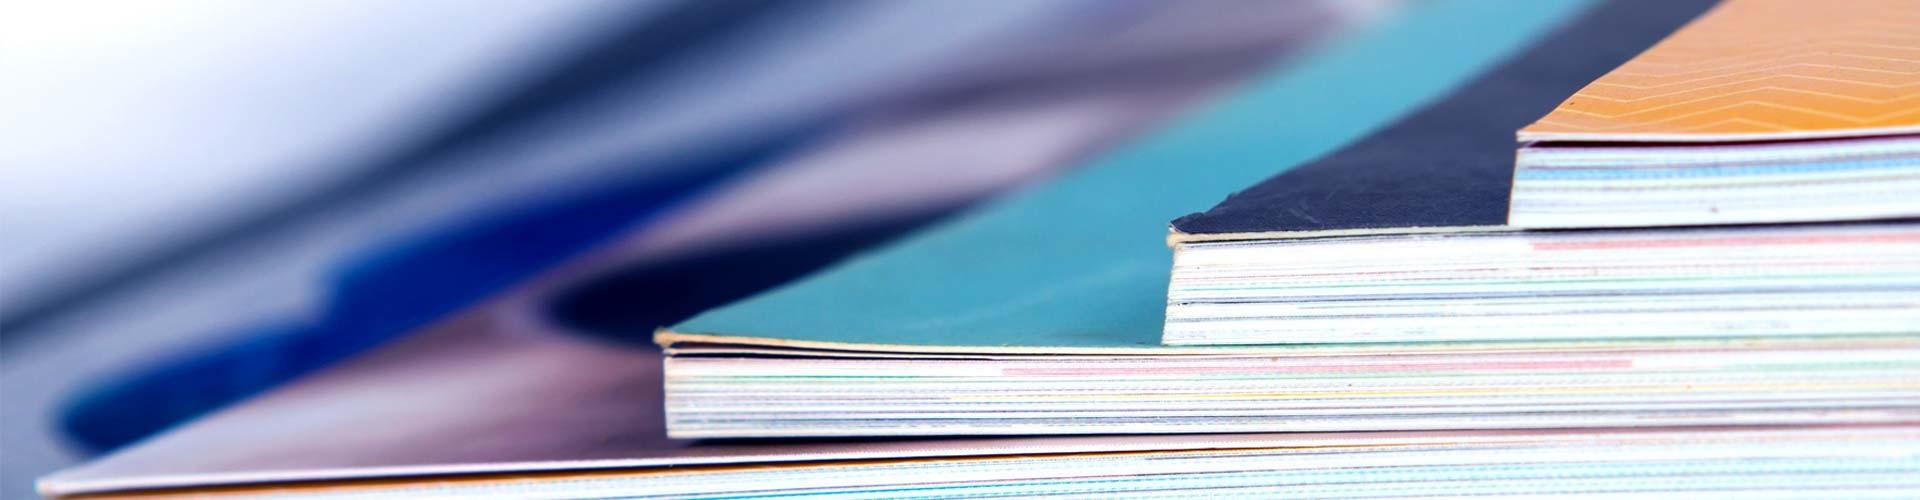 Bunte Hefte liegen übereinander © stock.adobe.com, stock.adobe.com